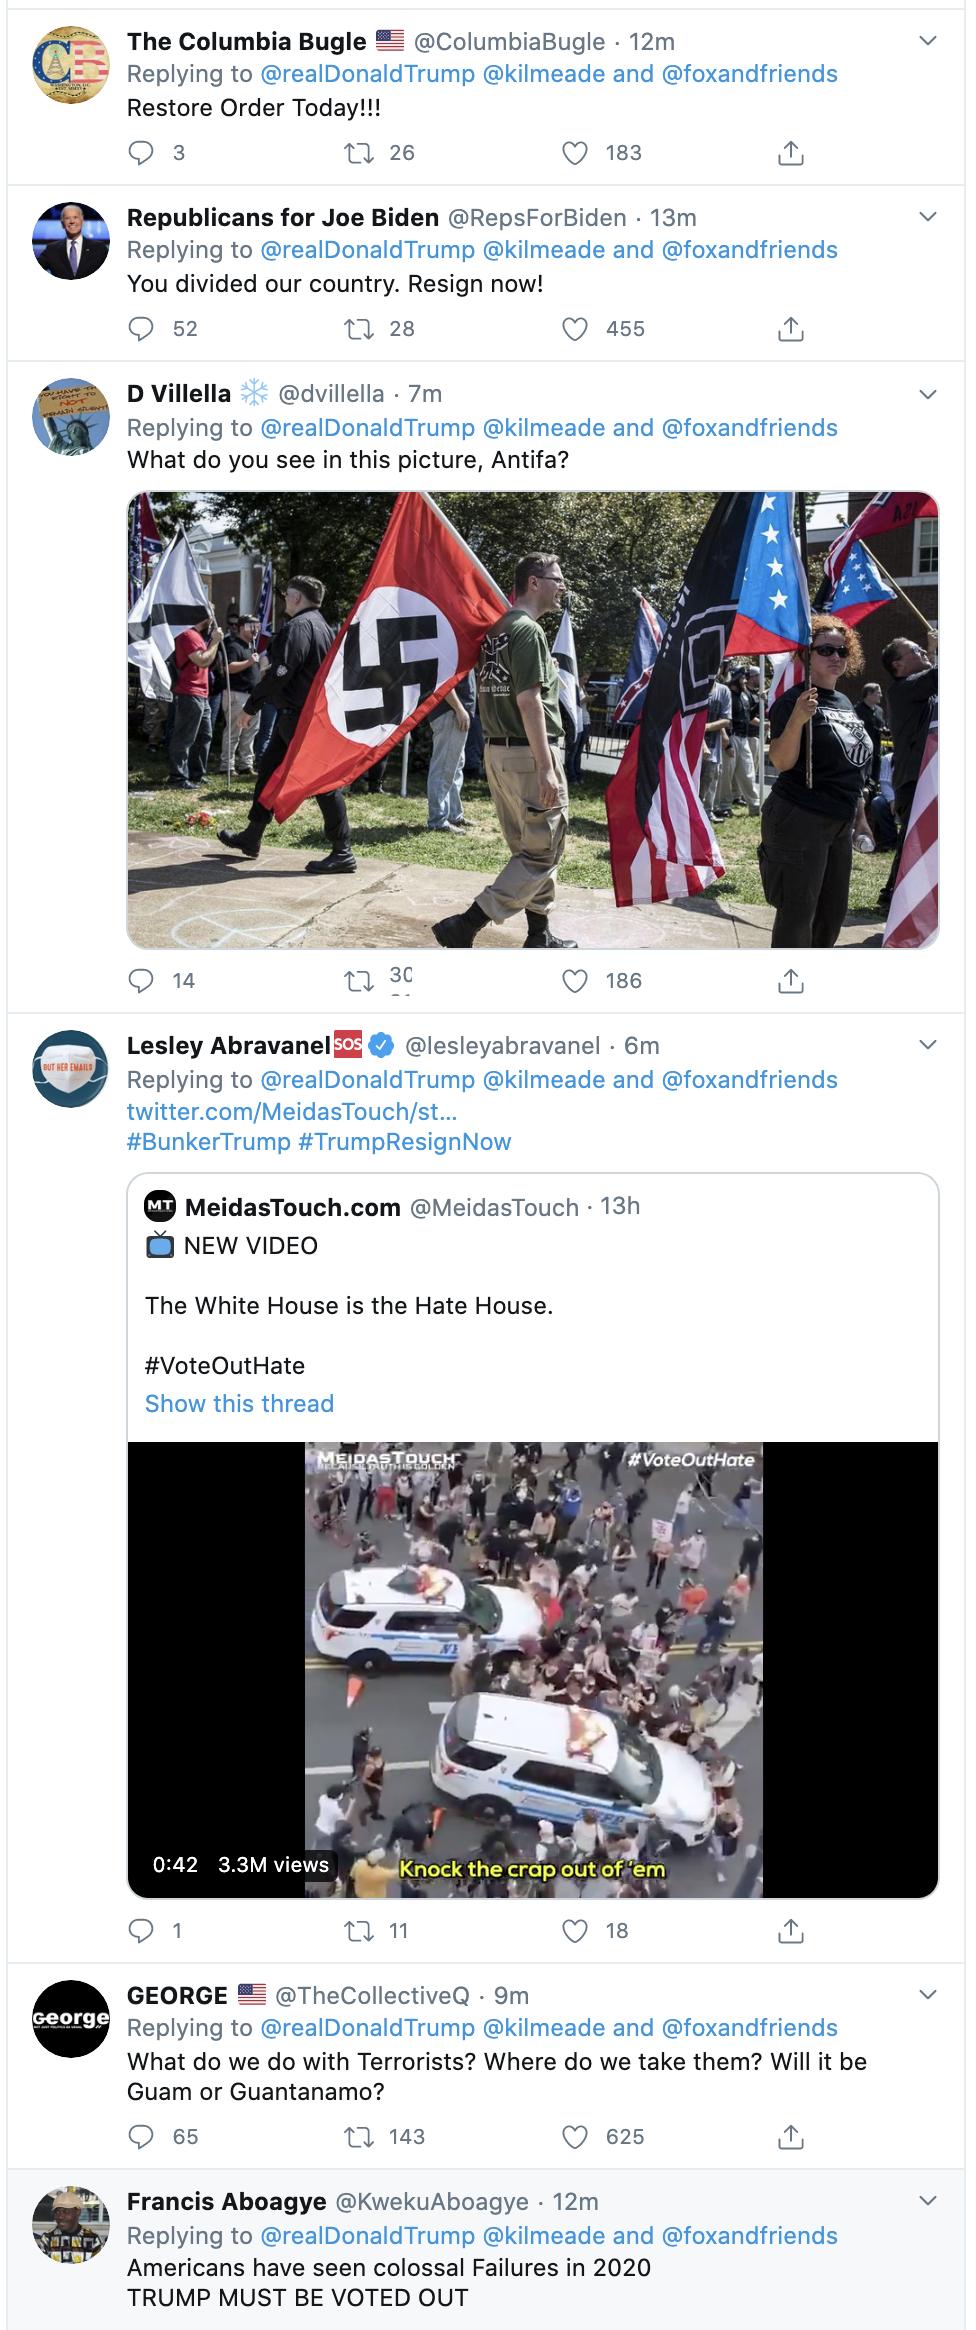 Screen-Shot-2020-06-01-at-7.34.47-AM-1 Trump Suffers Pre-Dawn Emotional Collapse Over 'ANTIFA', Biden, & Seattle Activism Black Lives Matter Featured Politics Top Stories